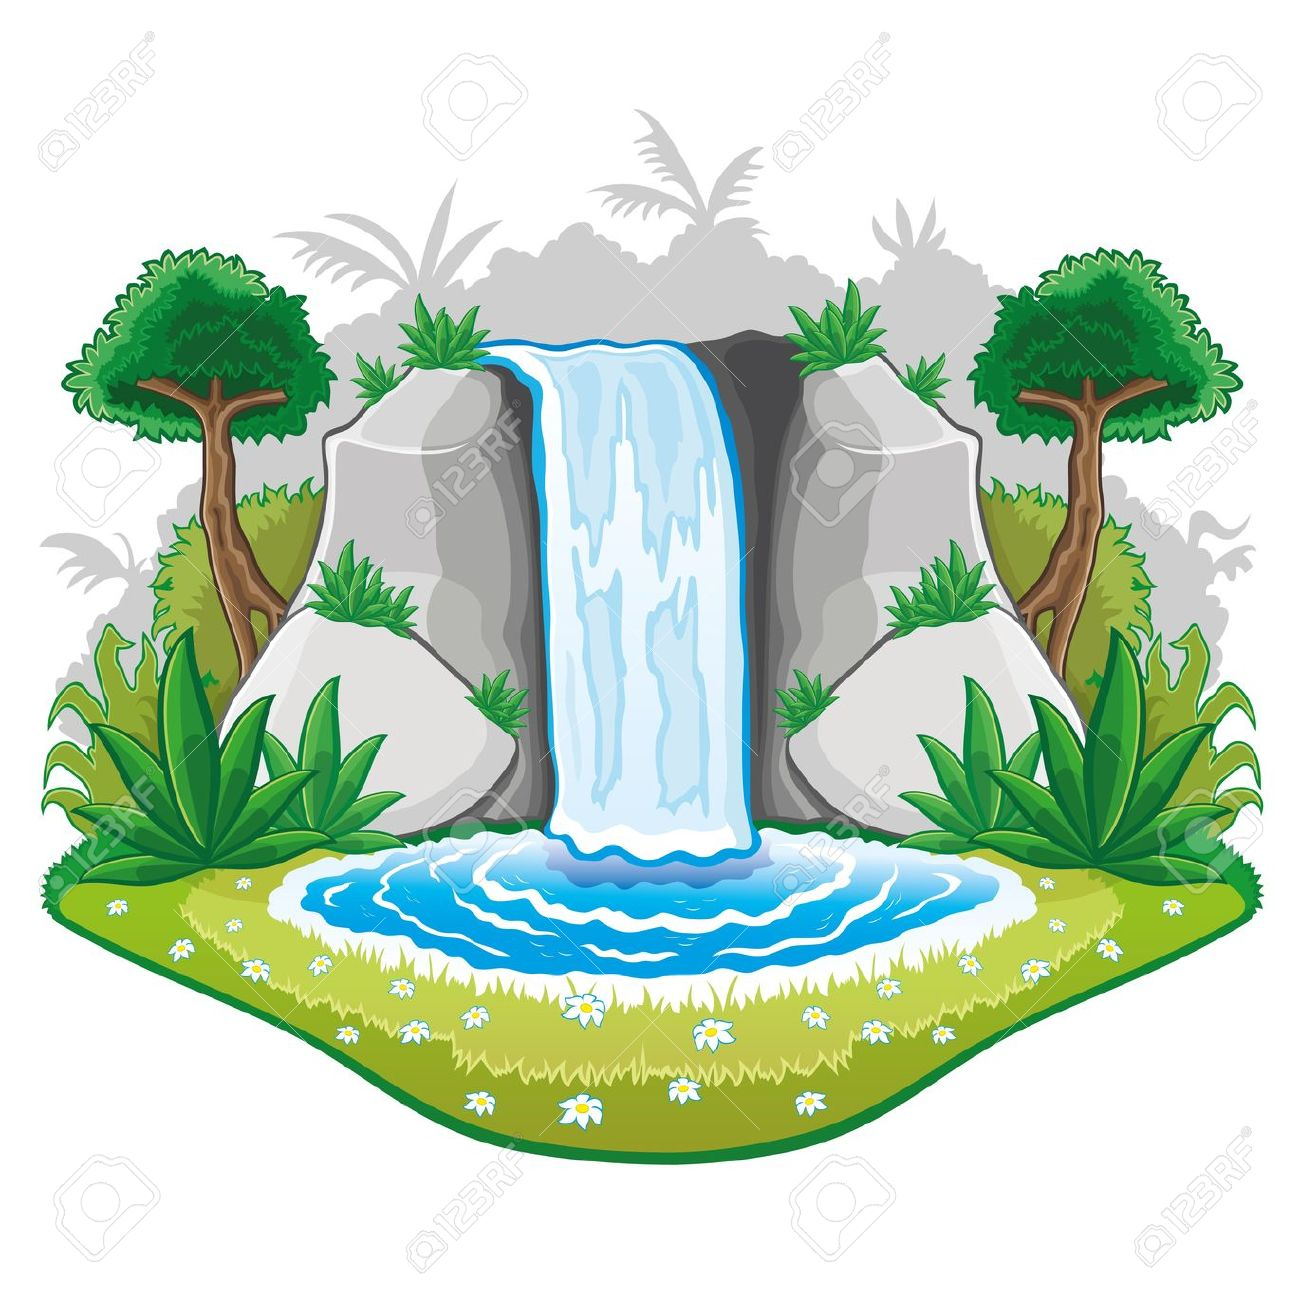 Mountain waterfall clipart.